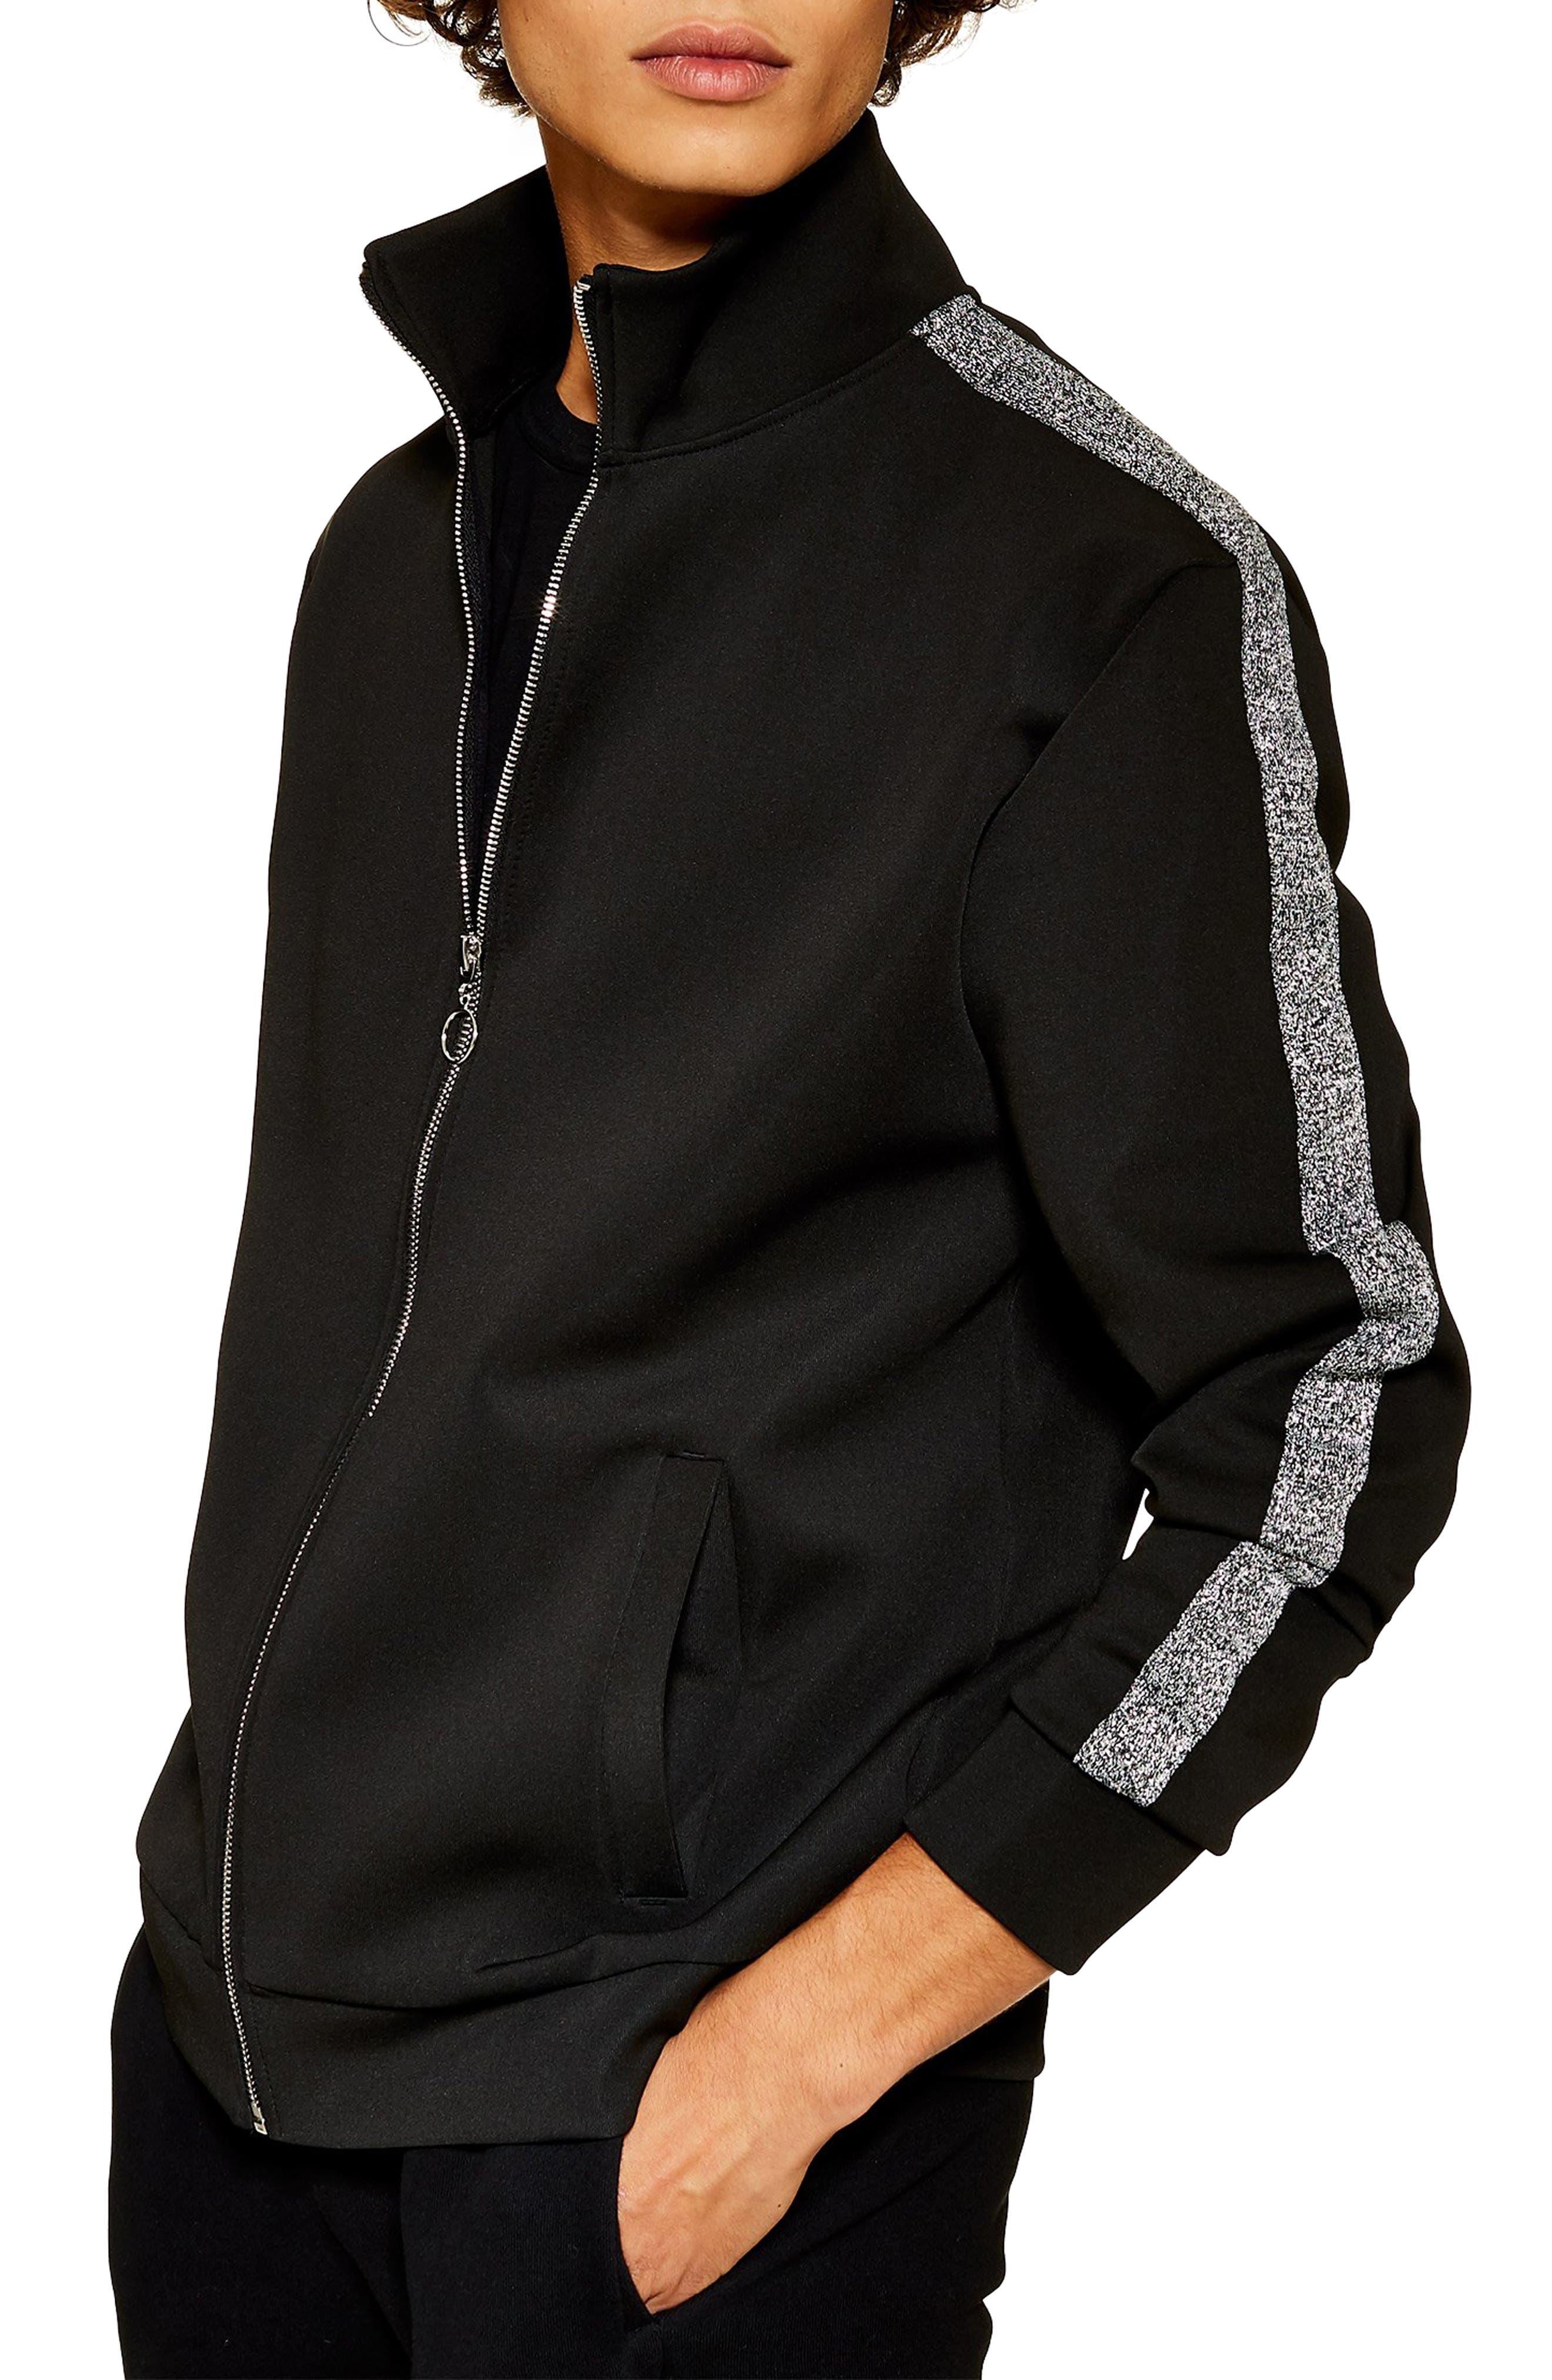 TOPMAN Classic Fit Metallic Stripe Track Jacket in Black Multi